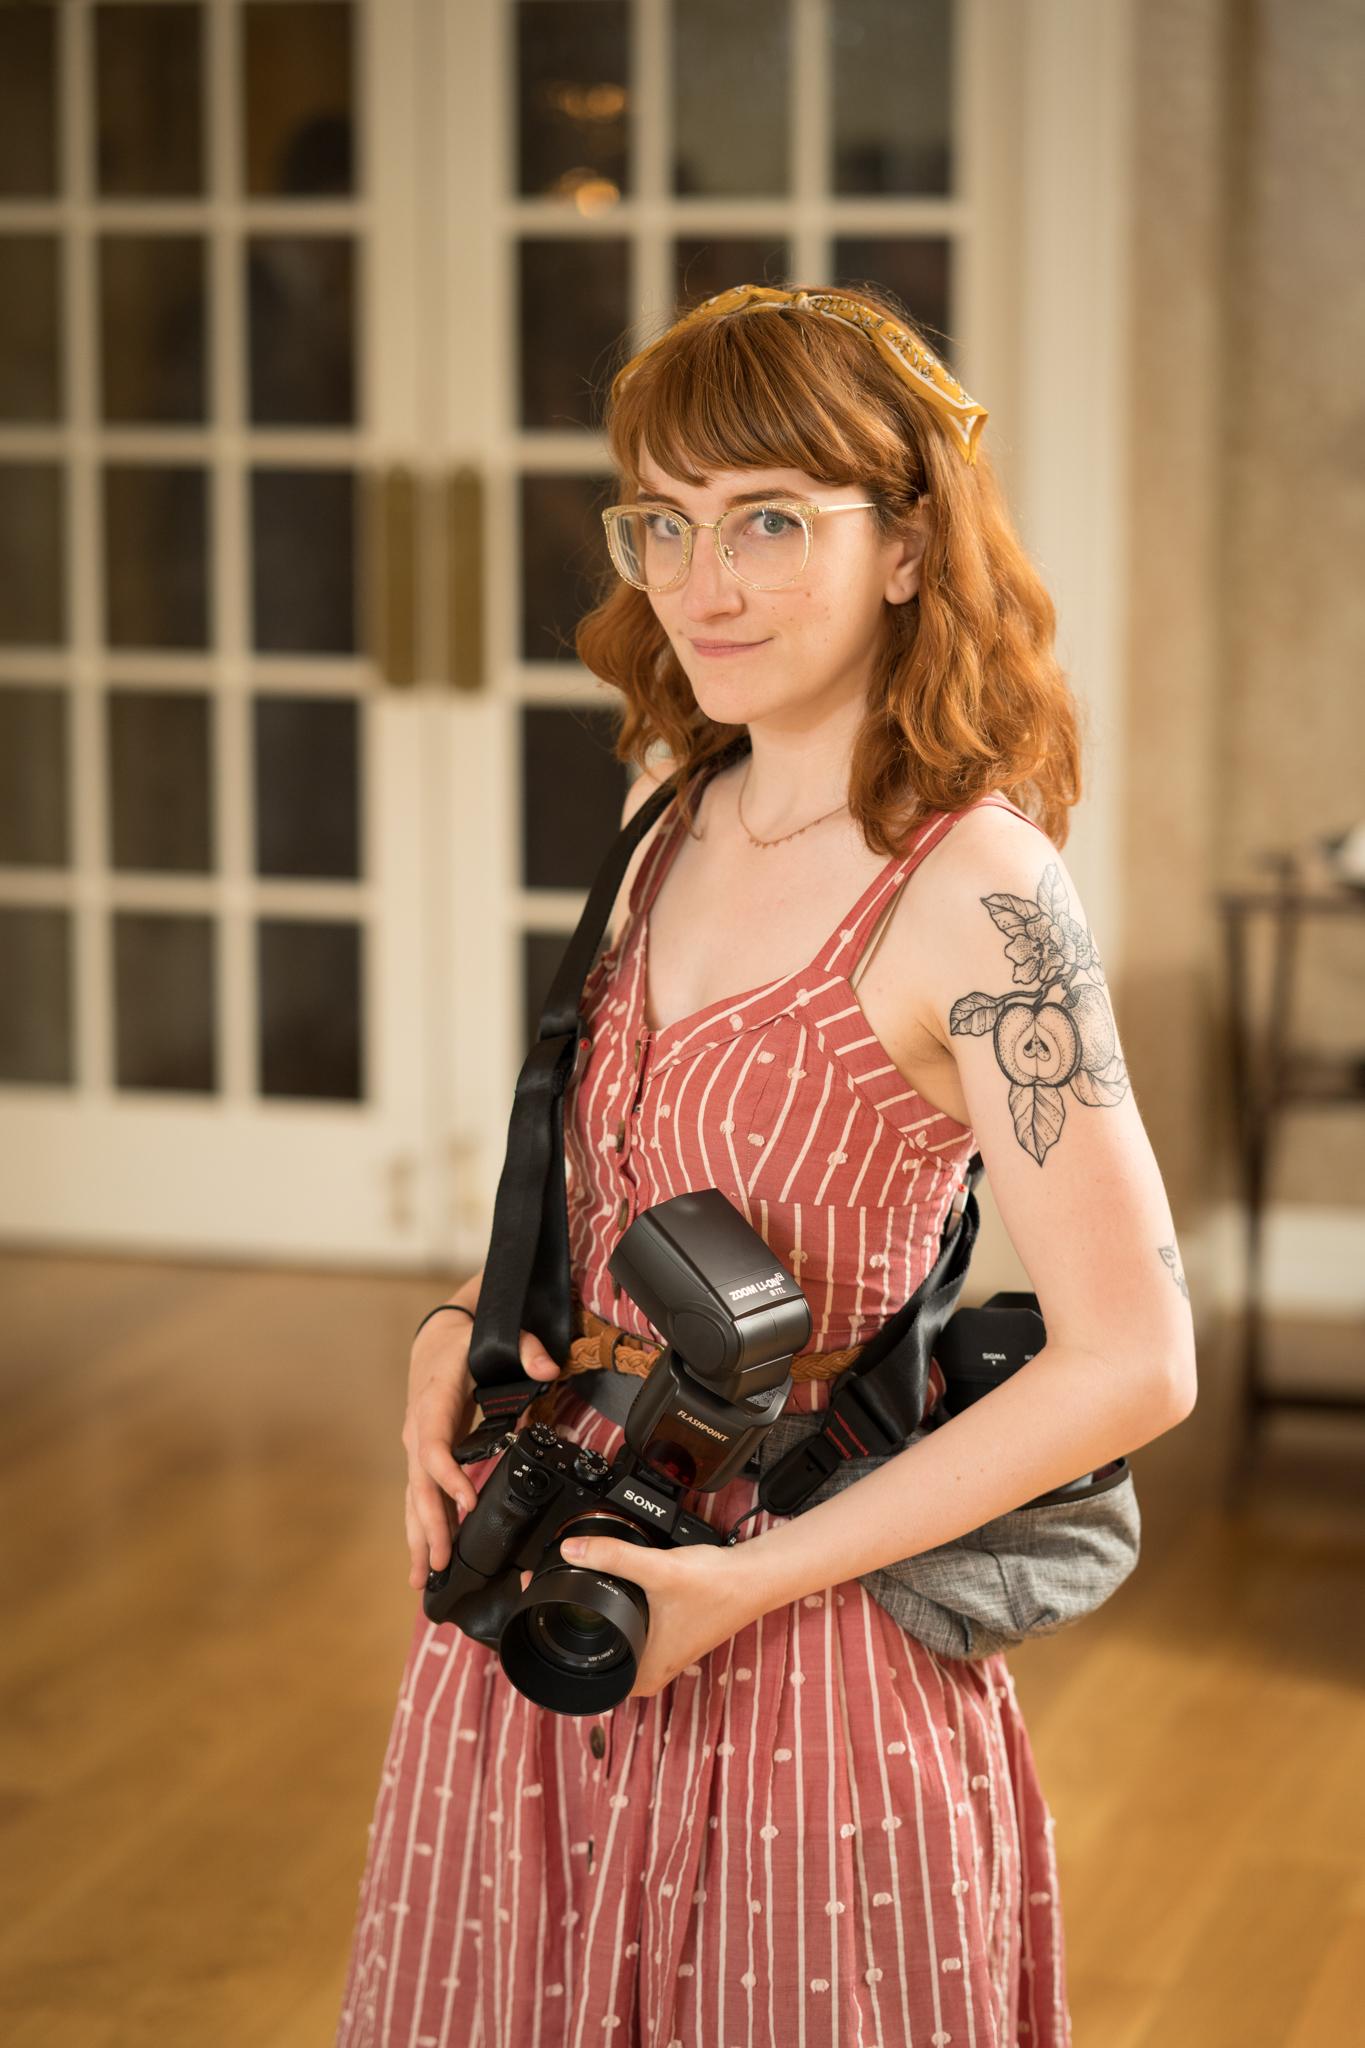 Jenna Pastore, Associate Shooter